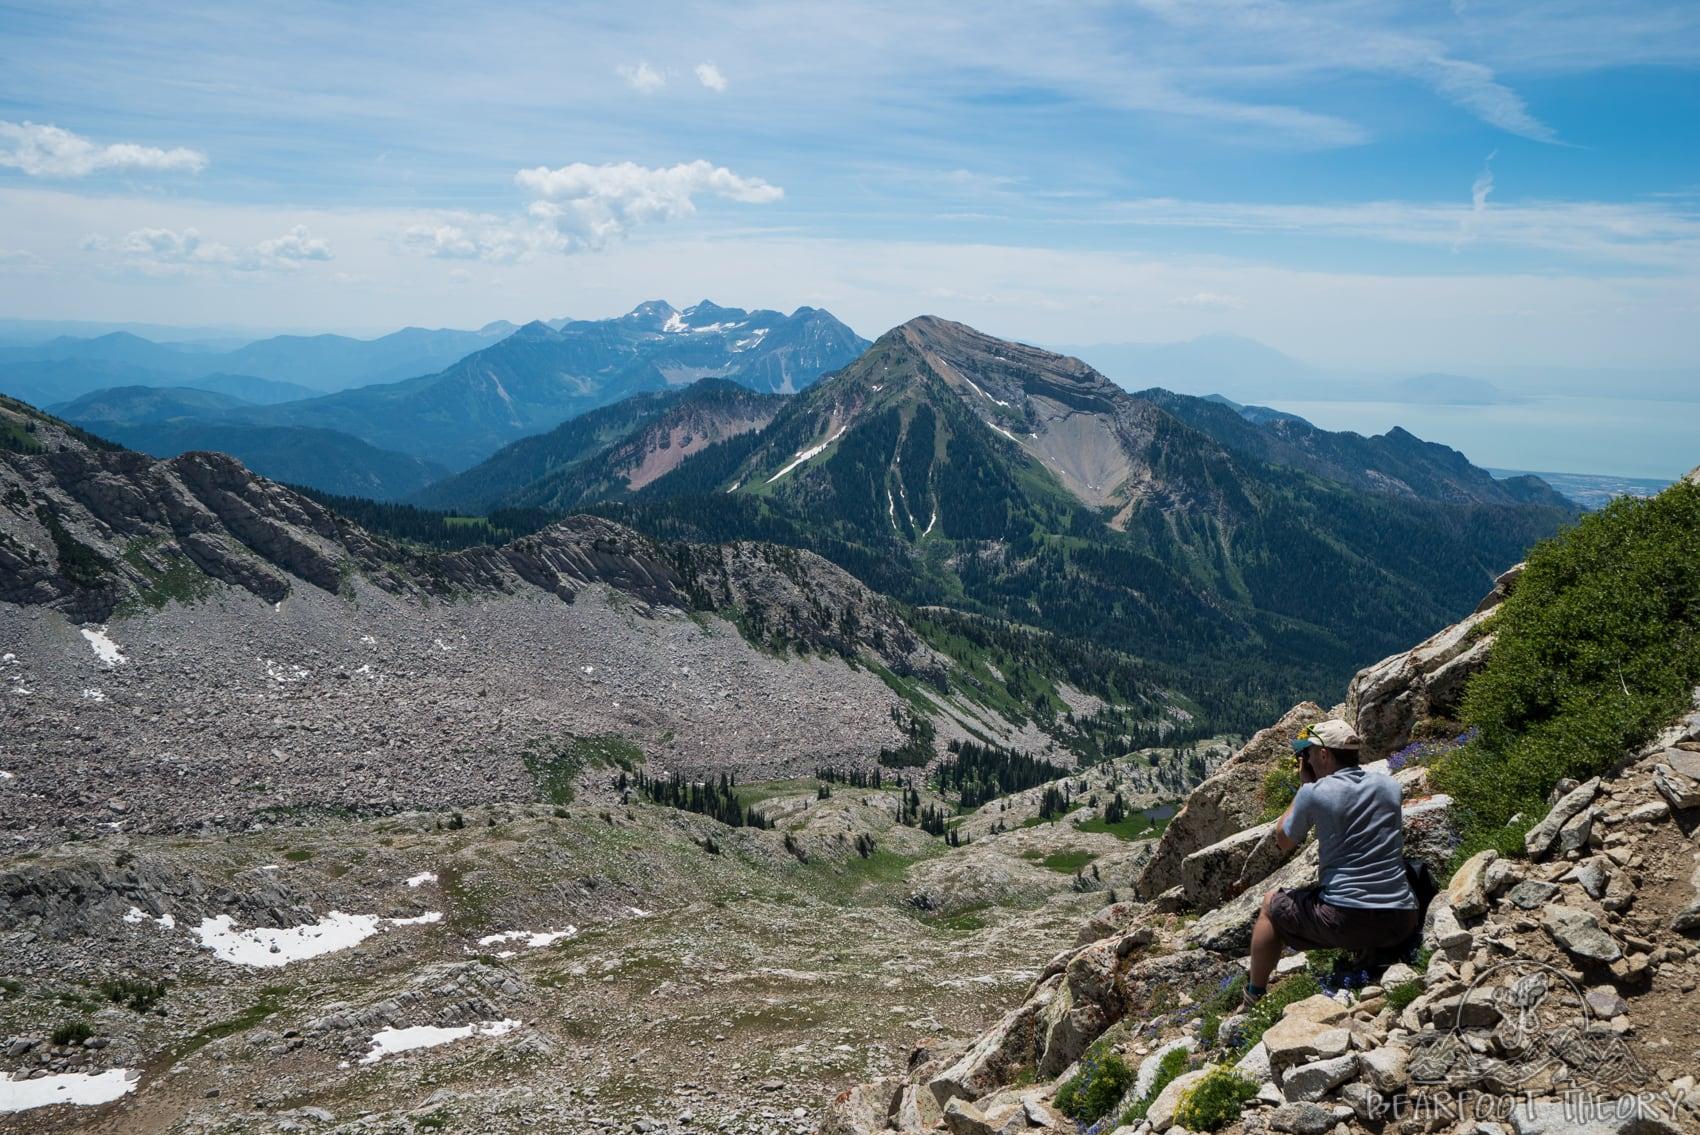 Views of Mt. Timpanogos from the Pfeifferhorn near Salt Lake City